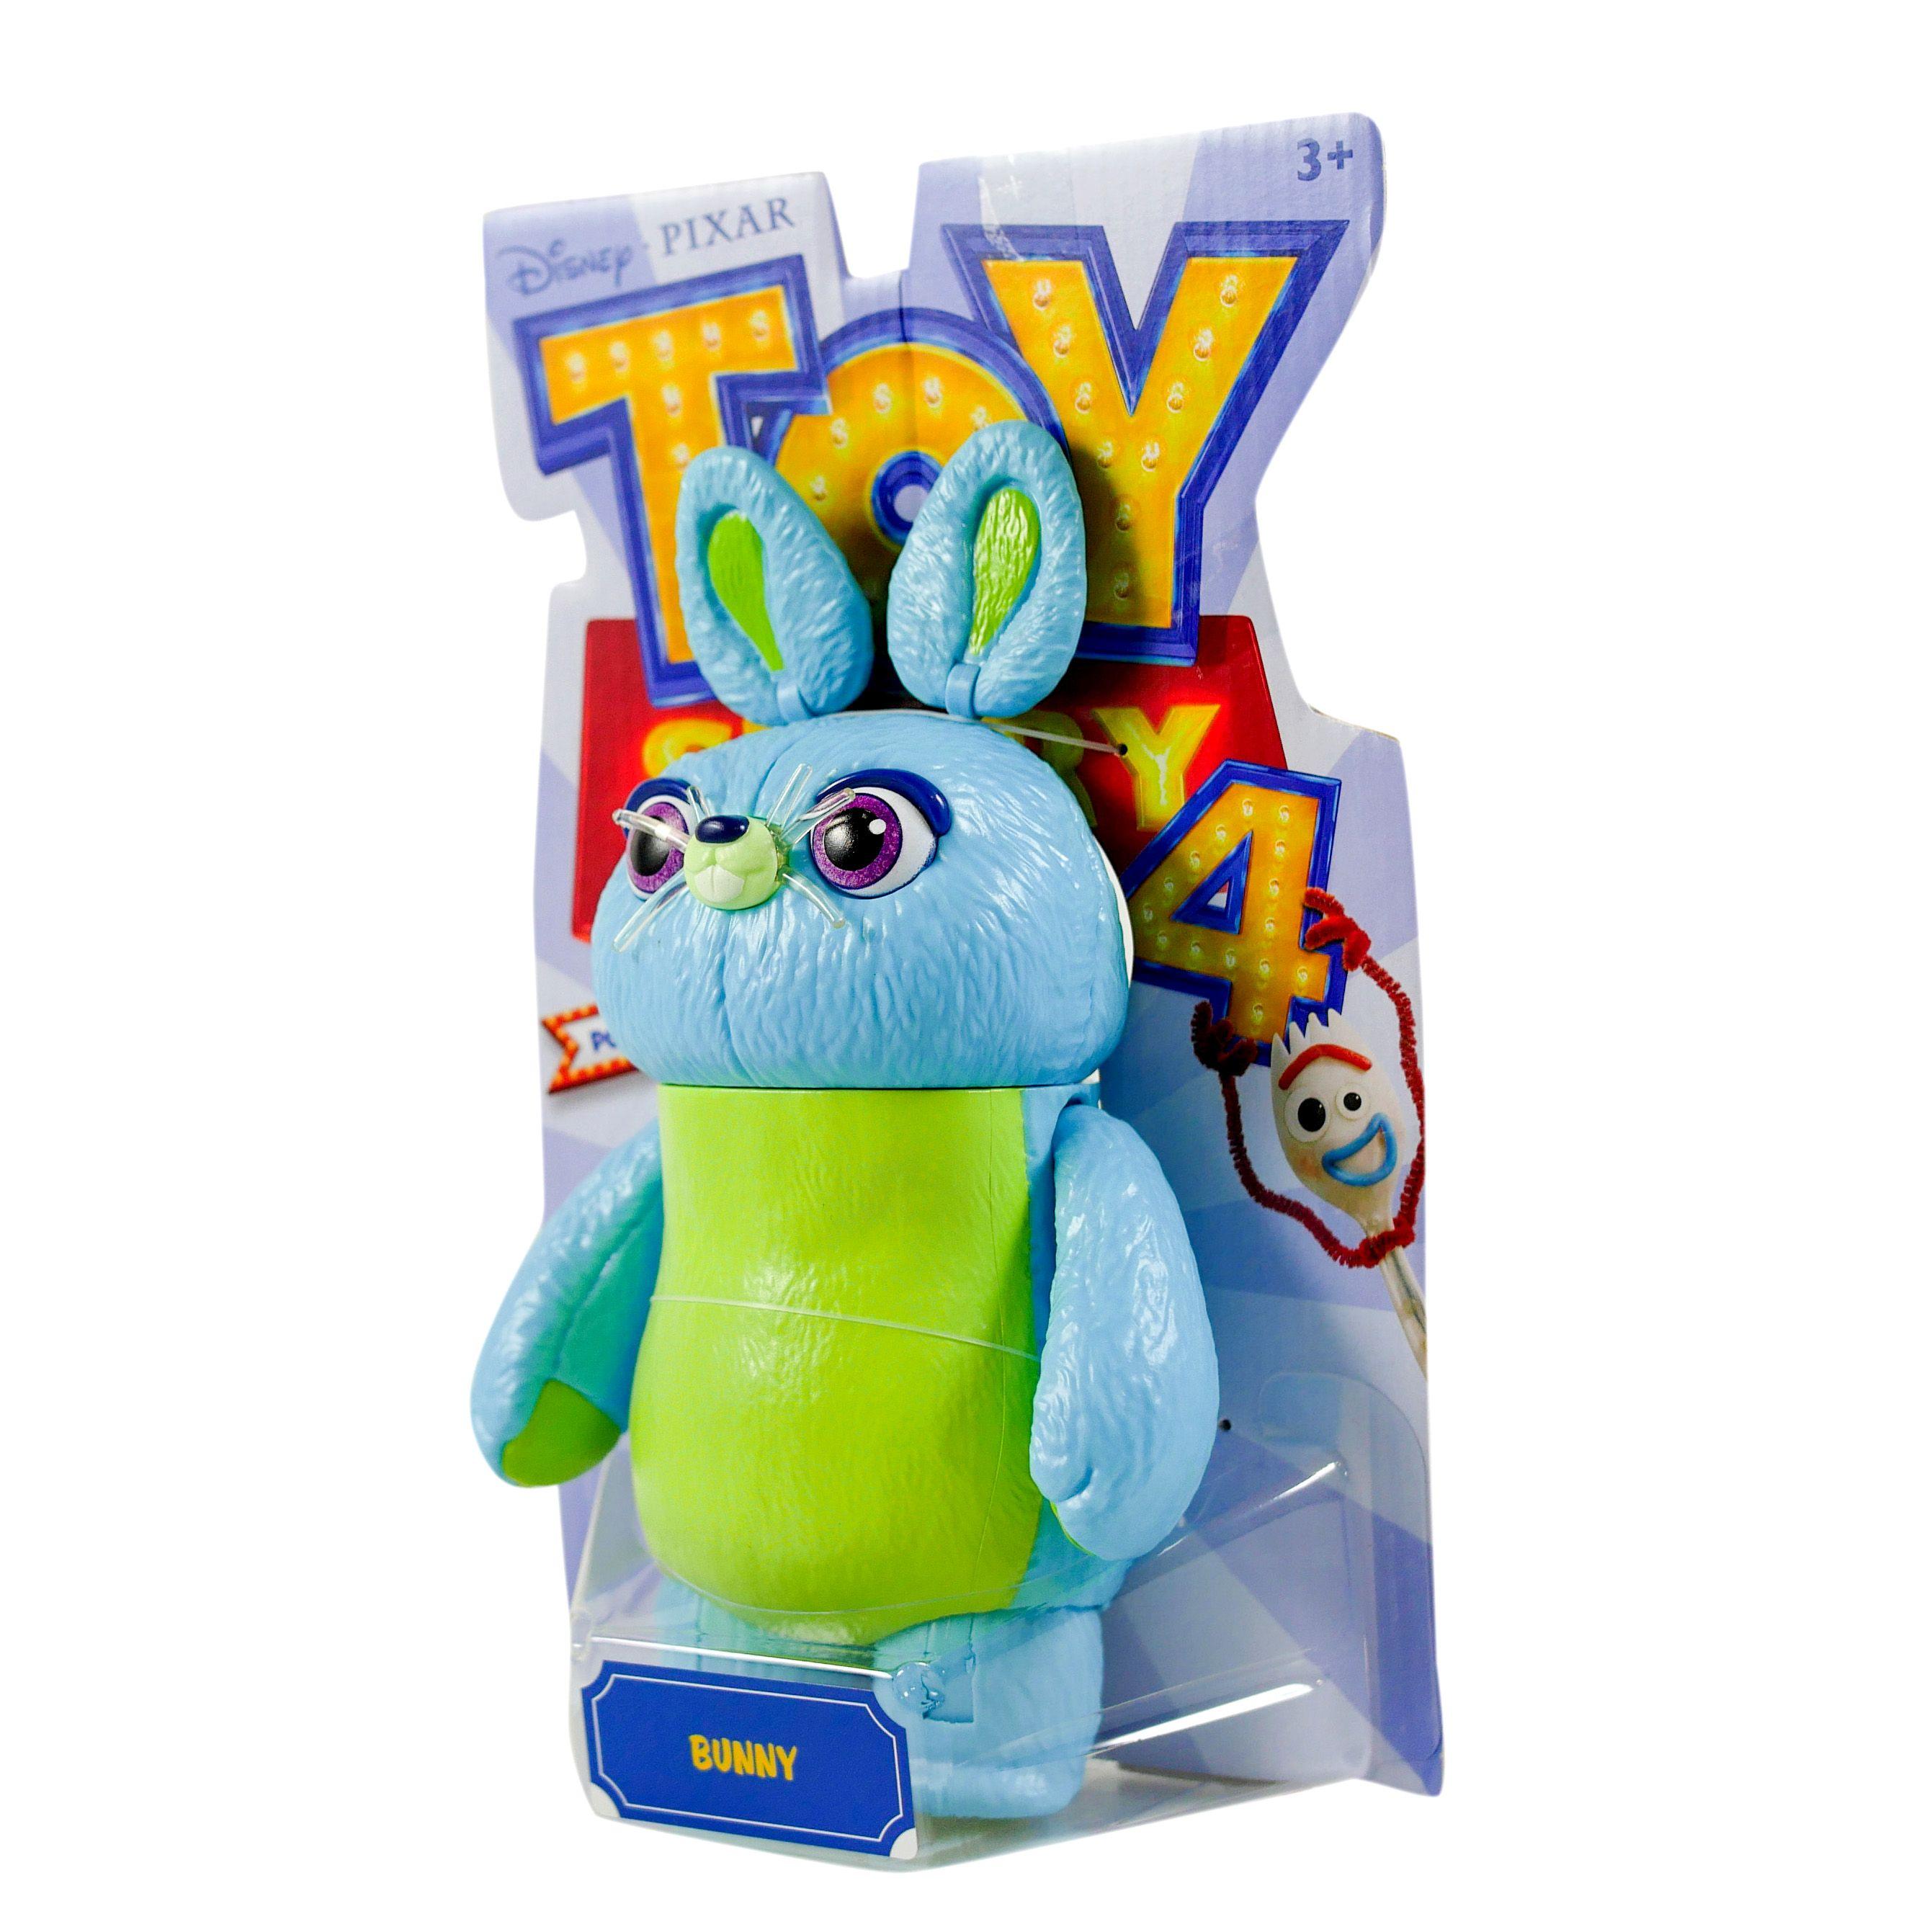 Disney Pixar Toy Story 4 Character Action Figure ...